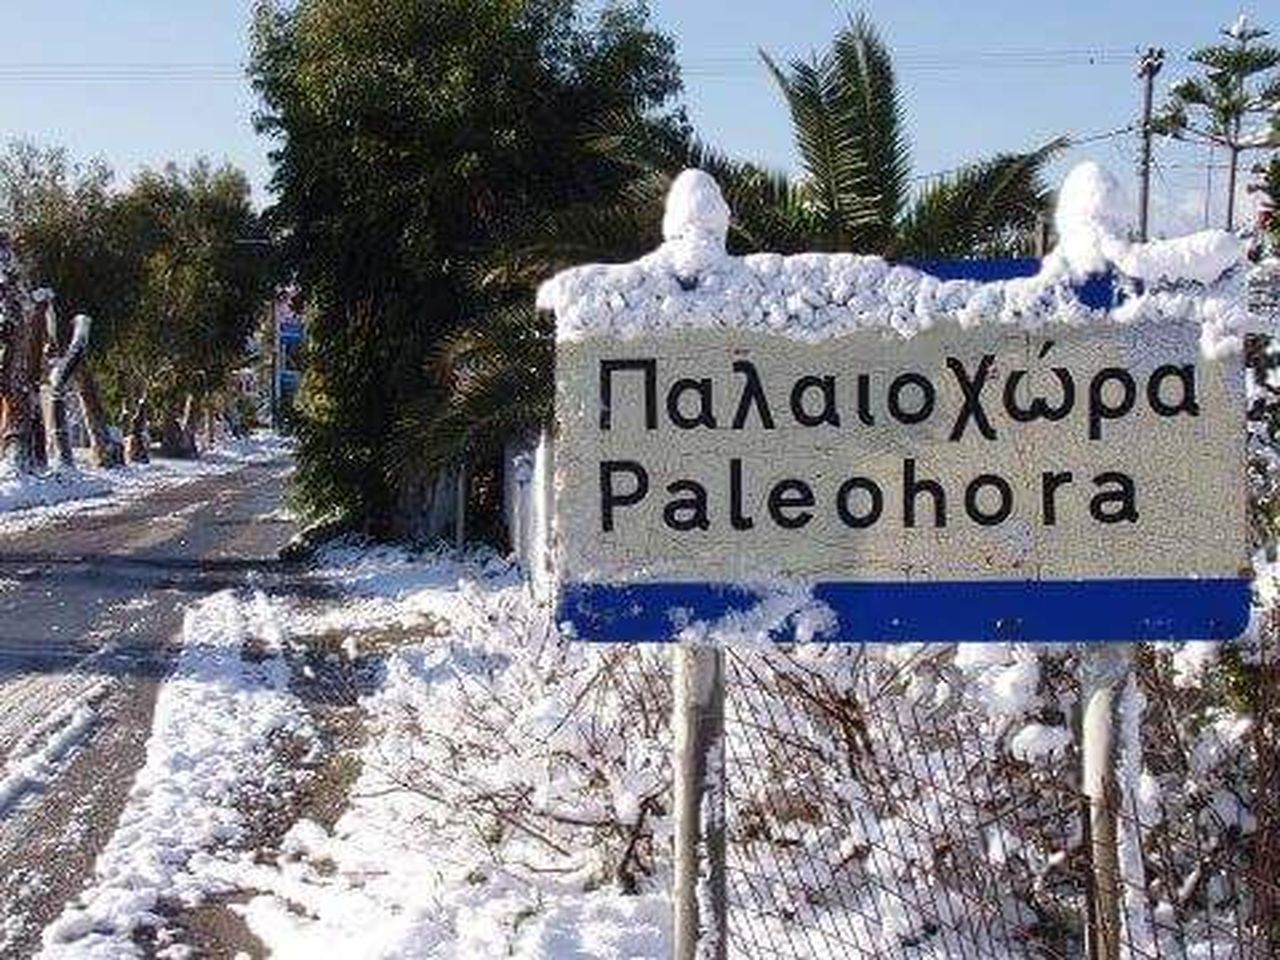 Kreta Wetter Aktuell